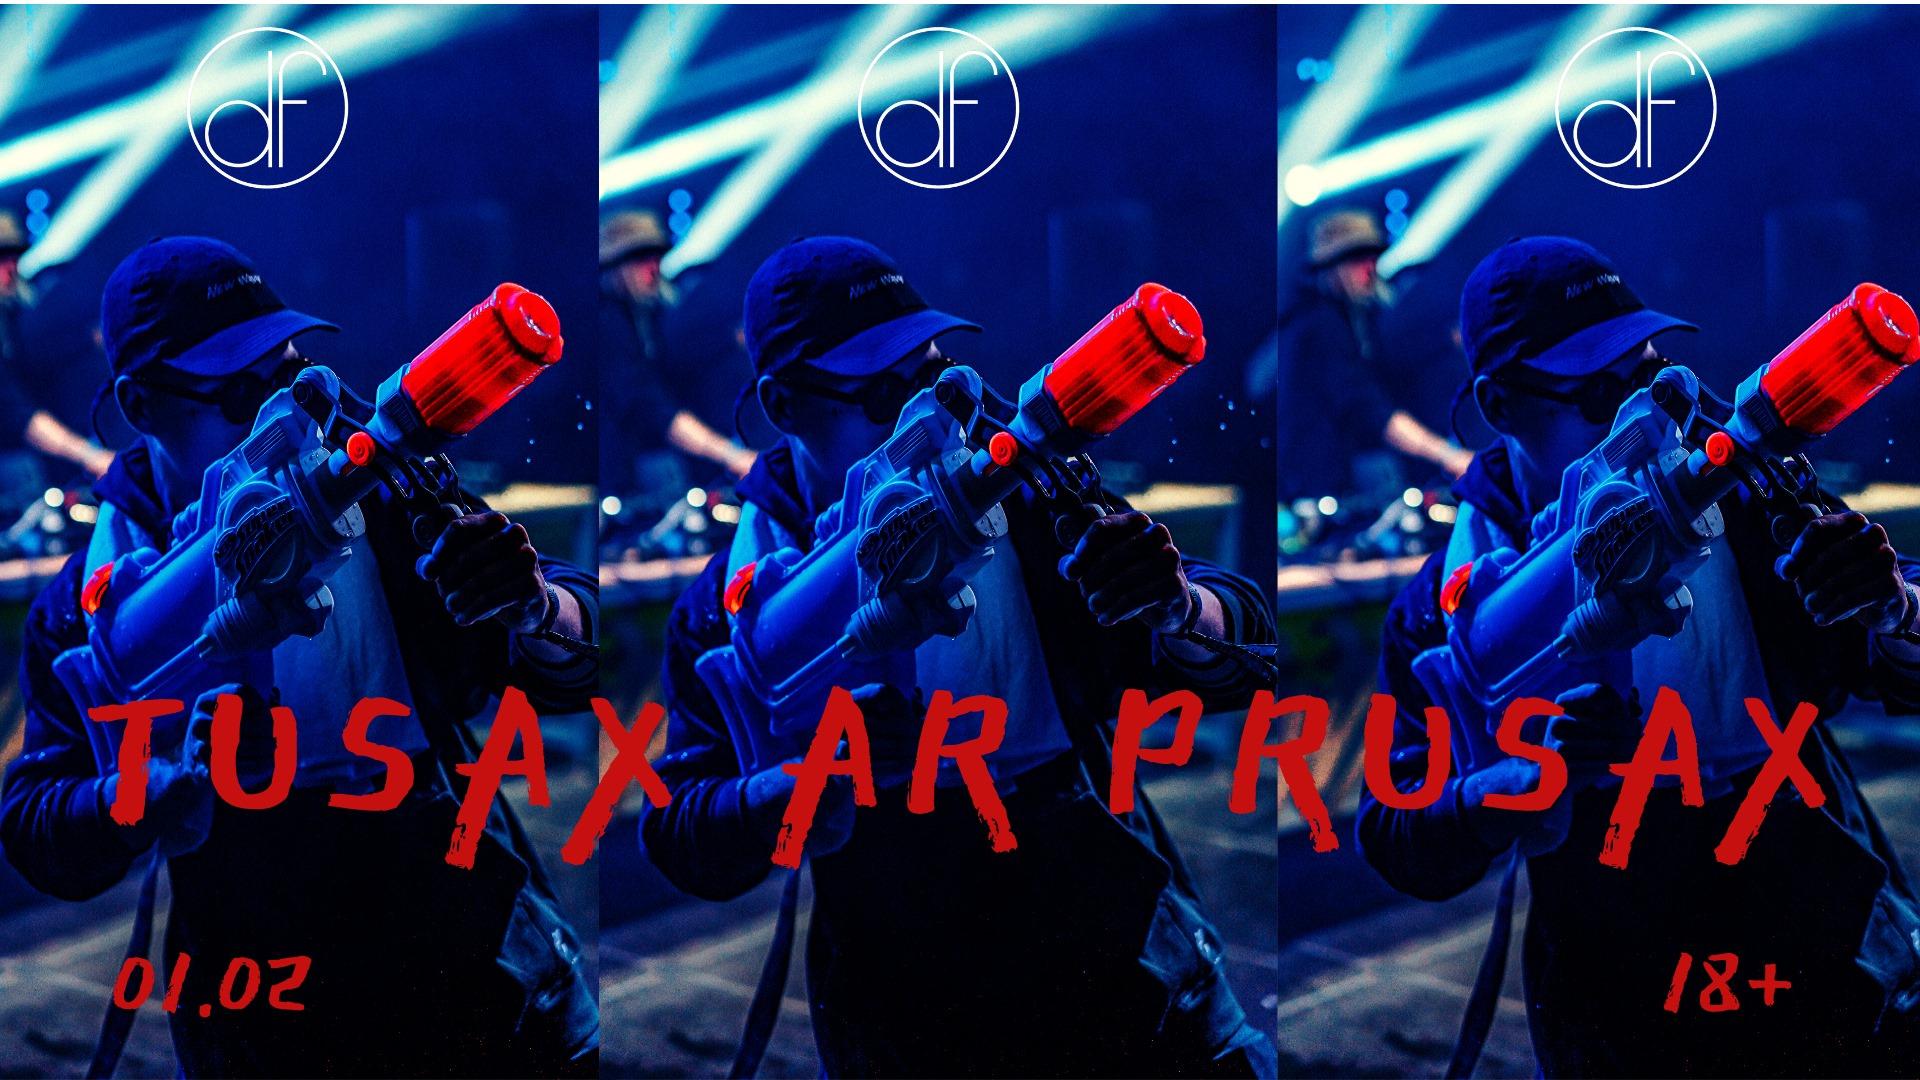 TUSAX AR PRUSAX